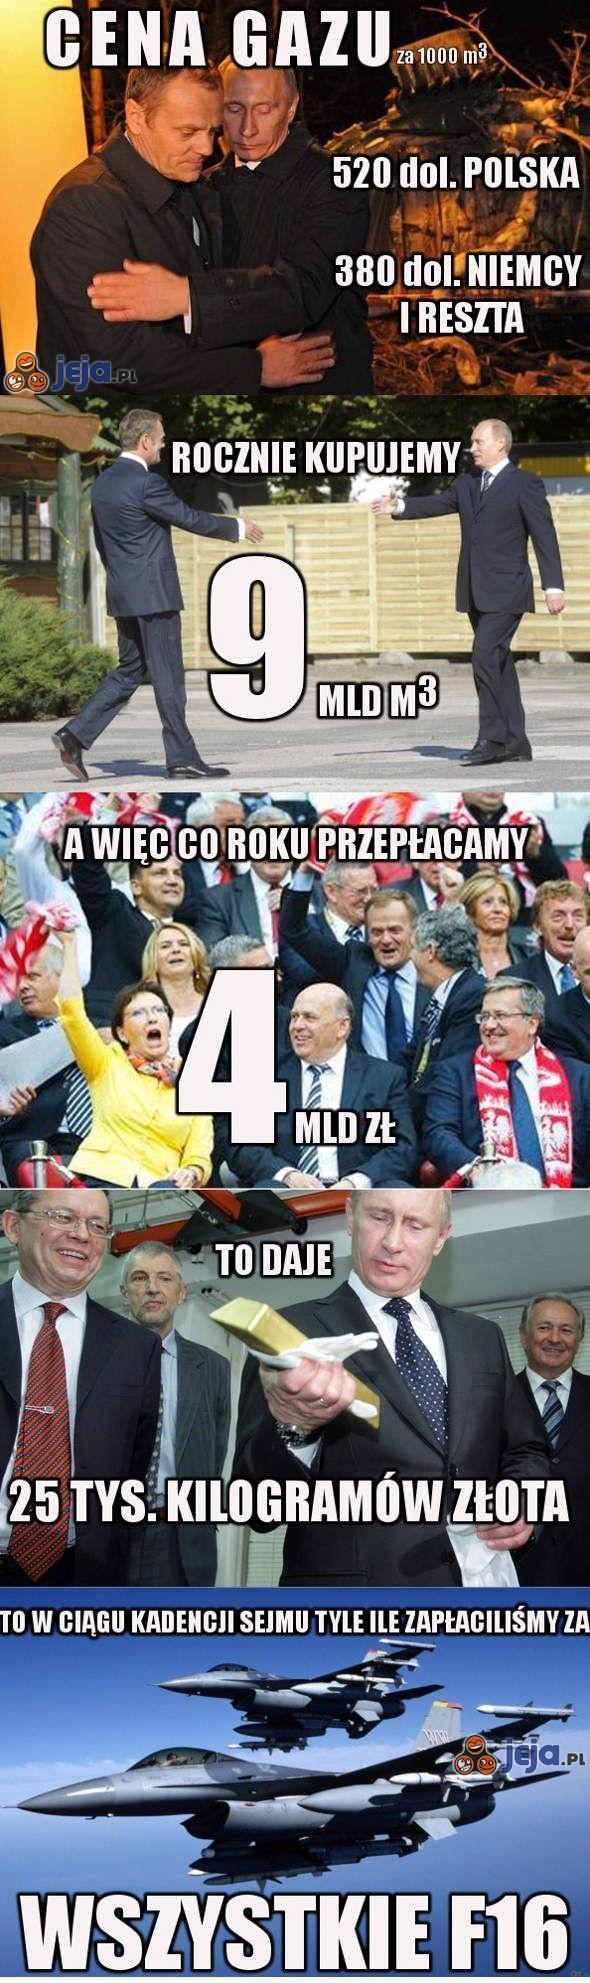 """Przyjaźń"" polsko-rosyjska?"